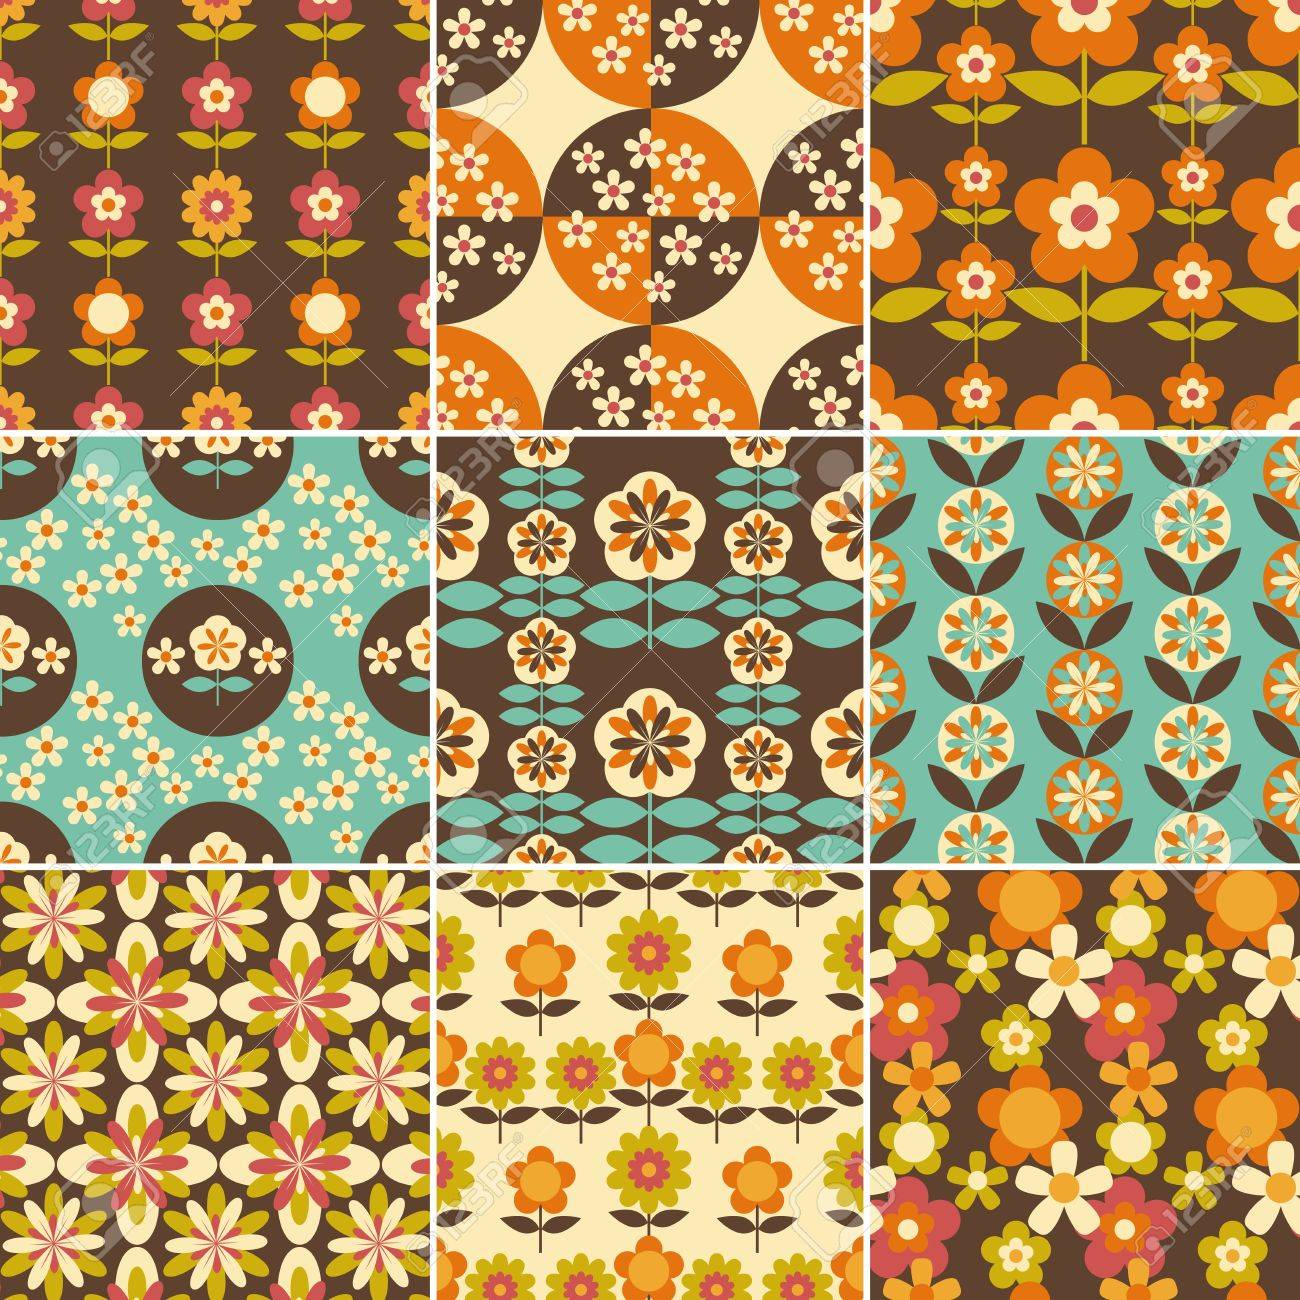 Set Of 20s Seamless Patterns Design Wallpaper Royalty Free ...